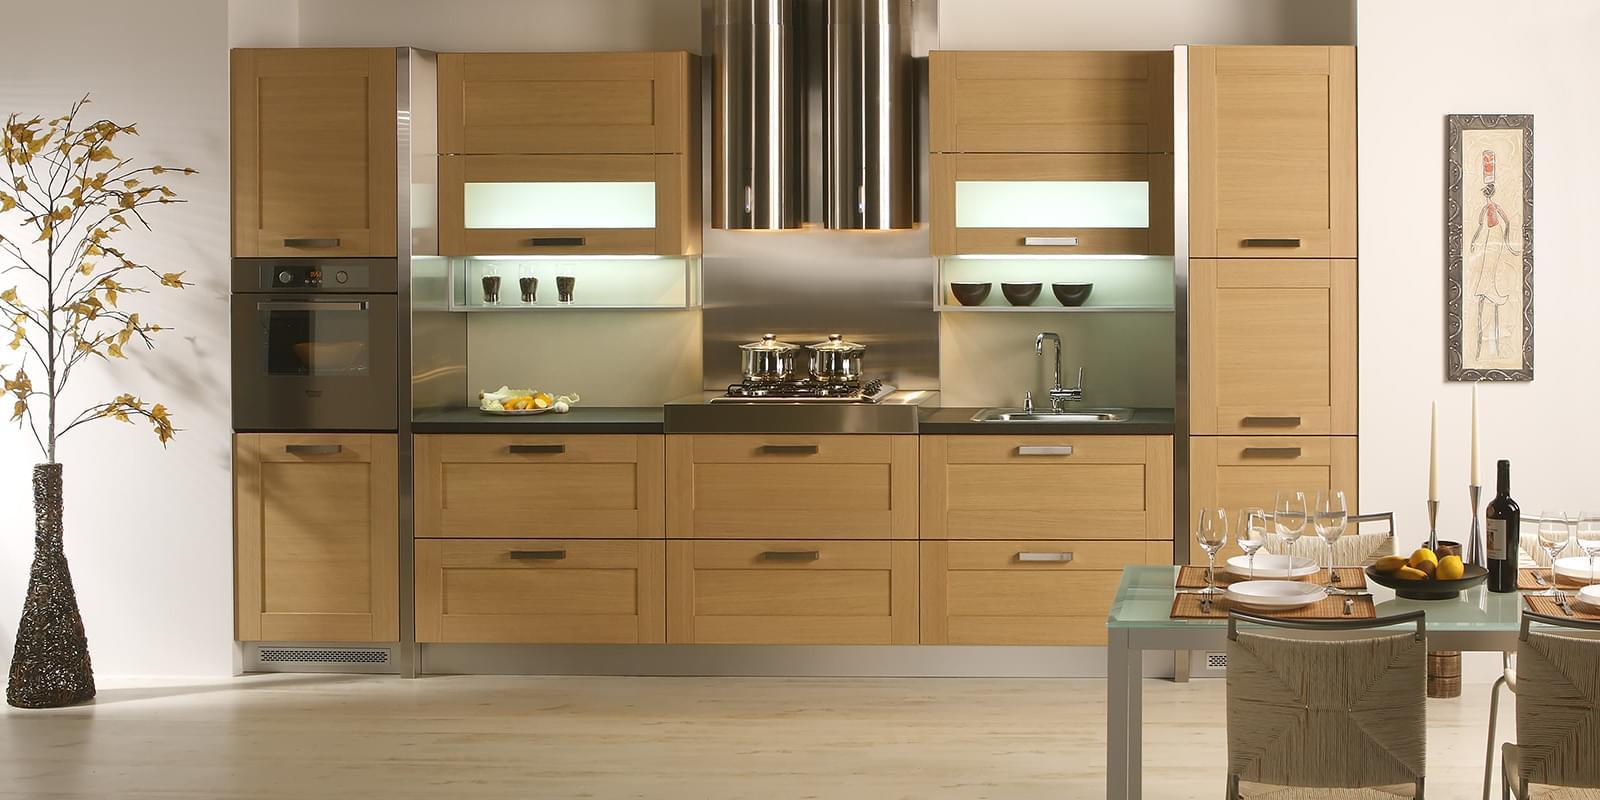 Dialog kitchens modern classic kitchens for Classic kitchen